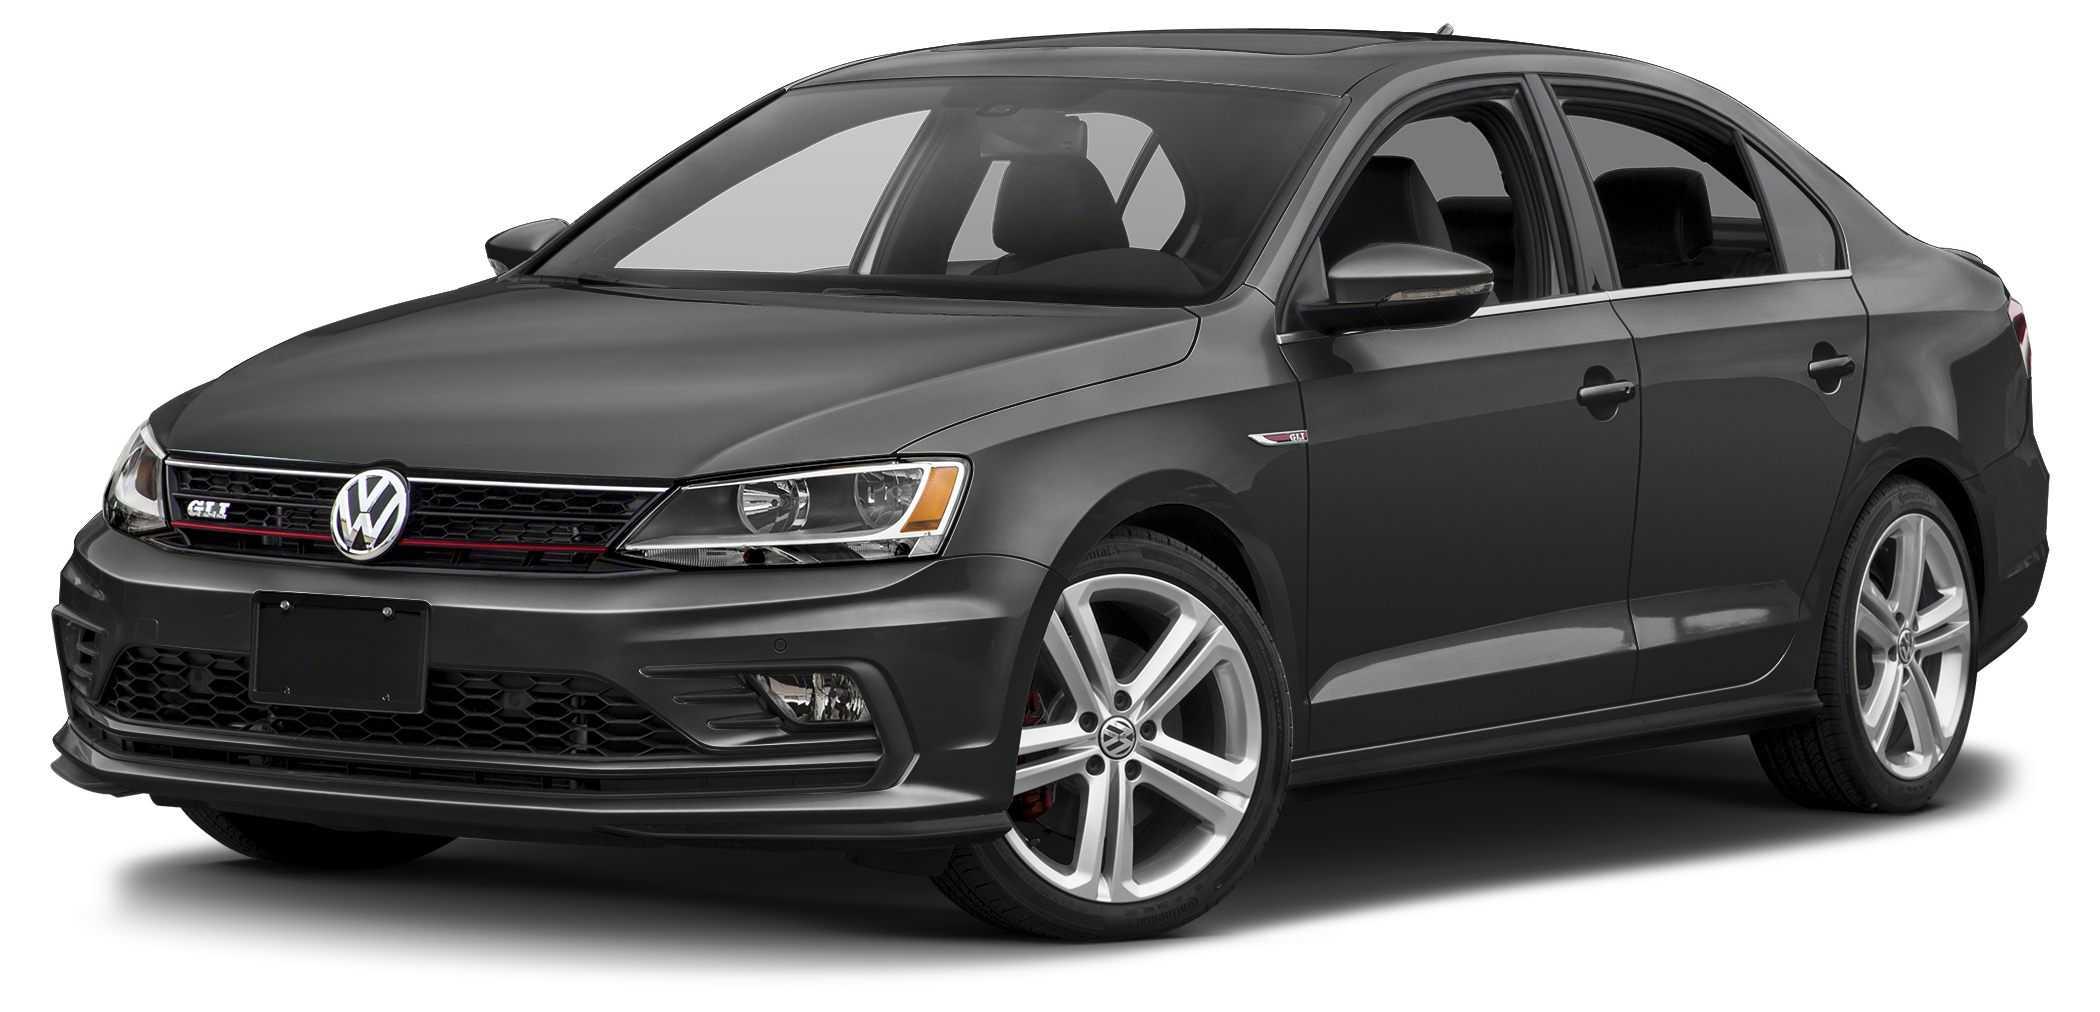 Colonial Volkswagen Medford 2017 2018 2019 Volkswagen Reviews